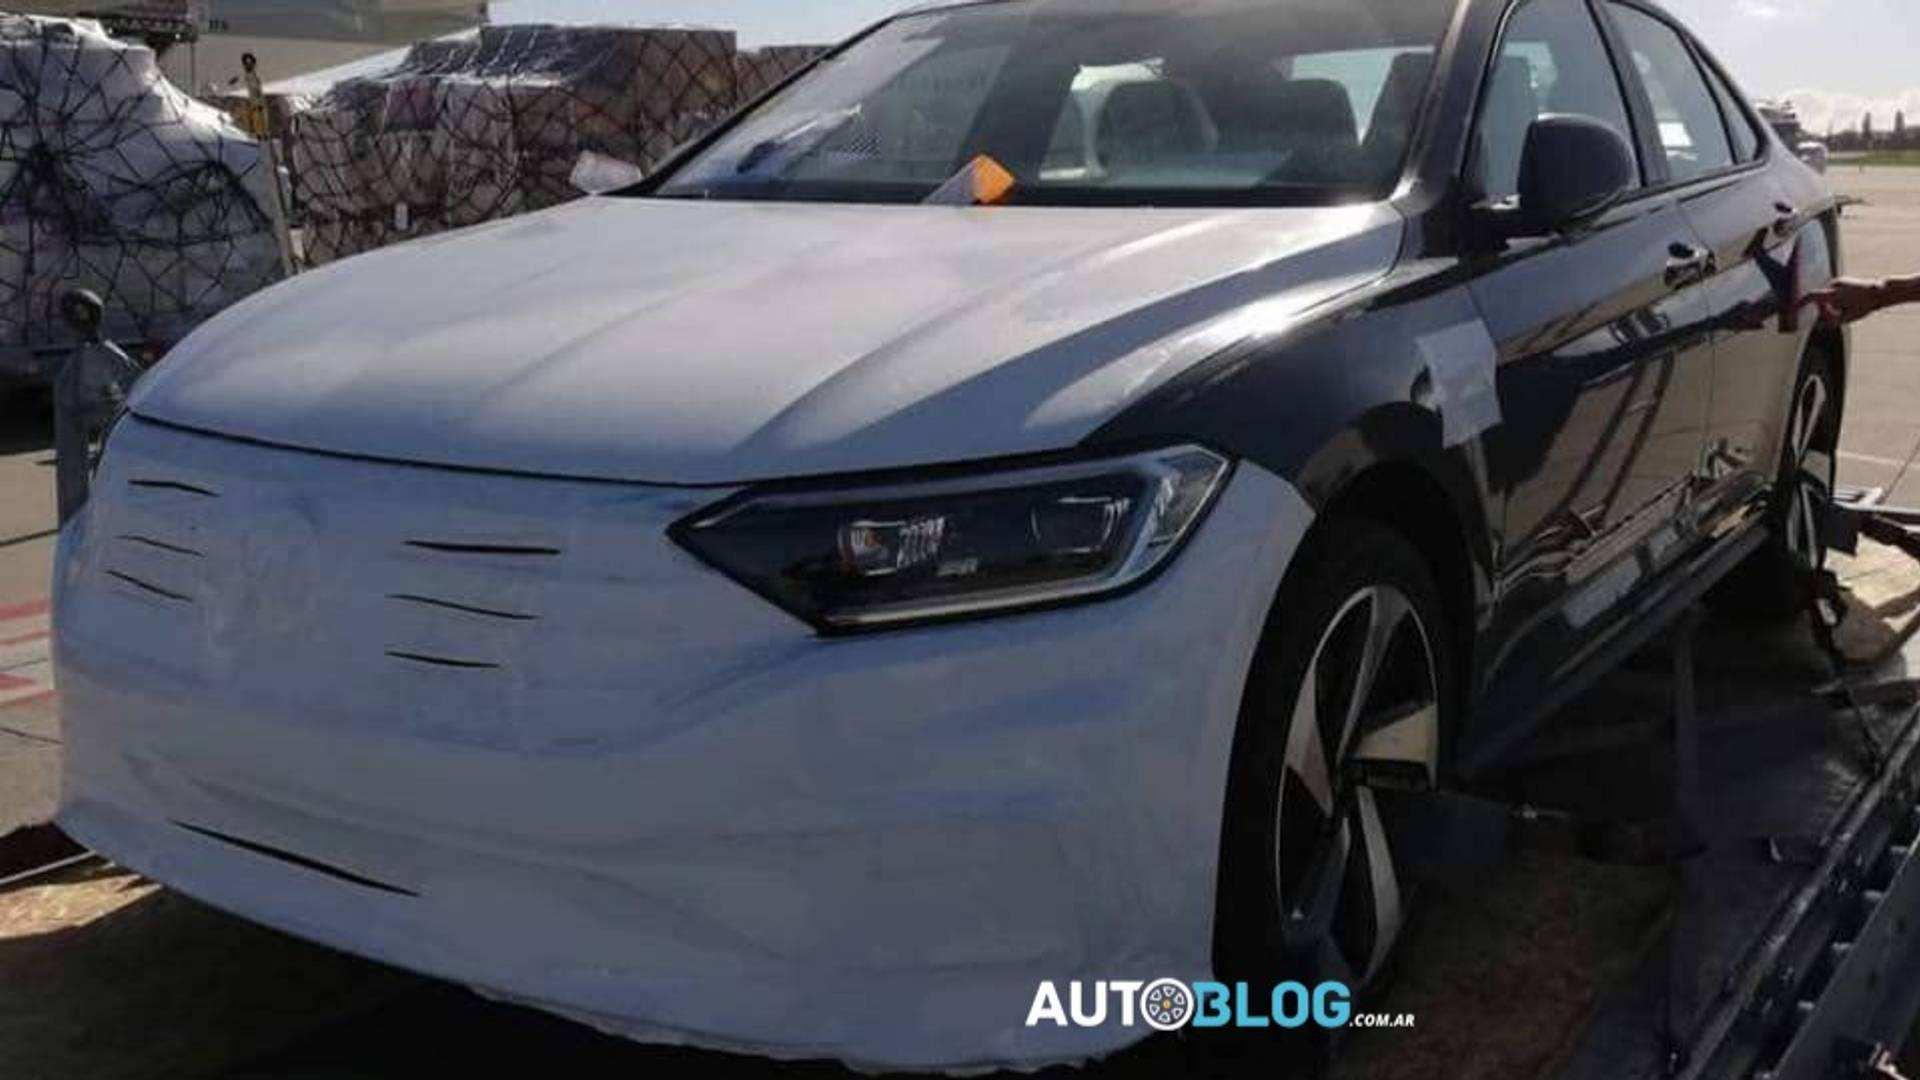 34 Gallery of 2020 Volkswagen Gli Research New for 2020 Volkswagen Gli